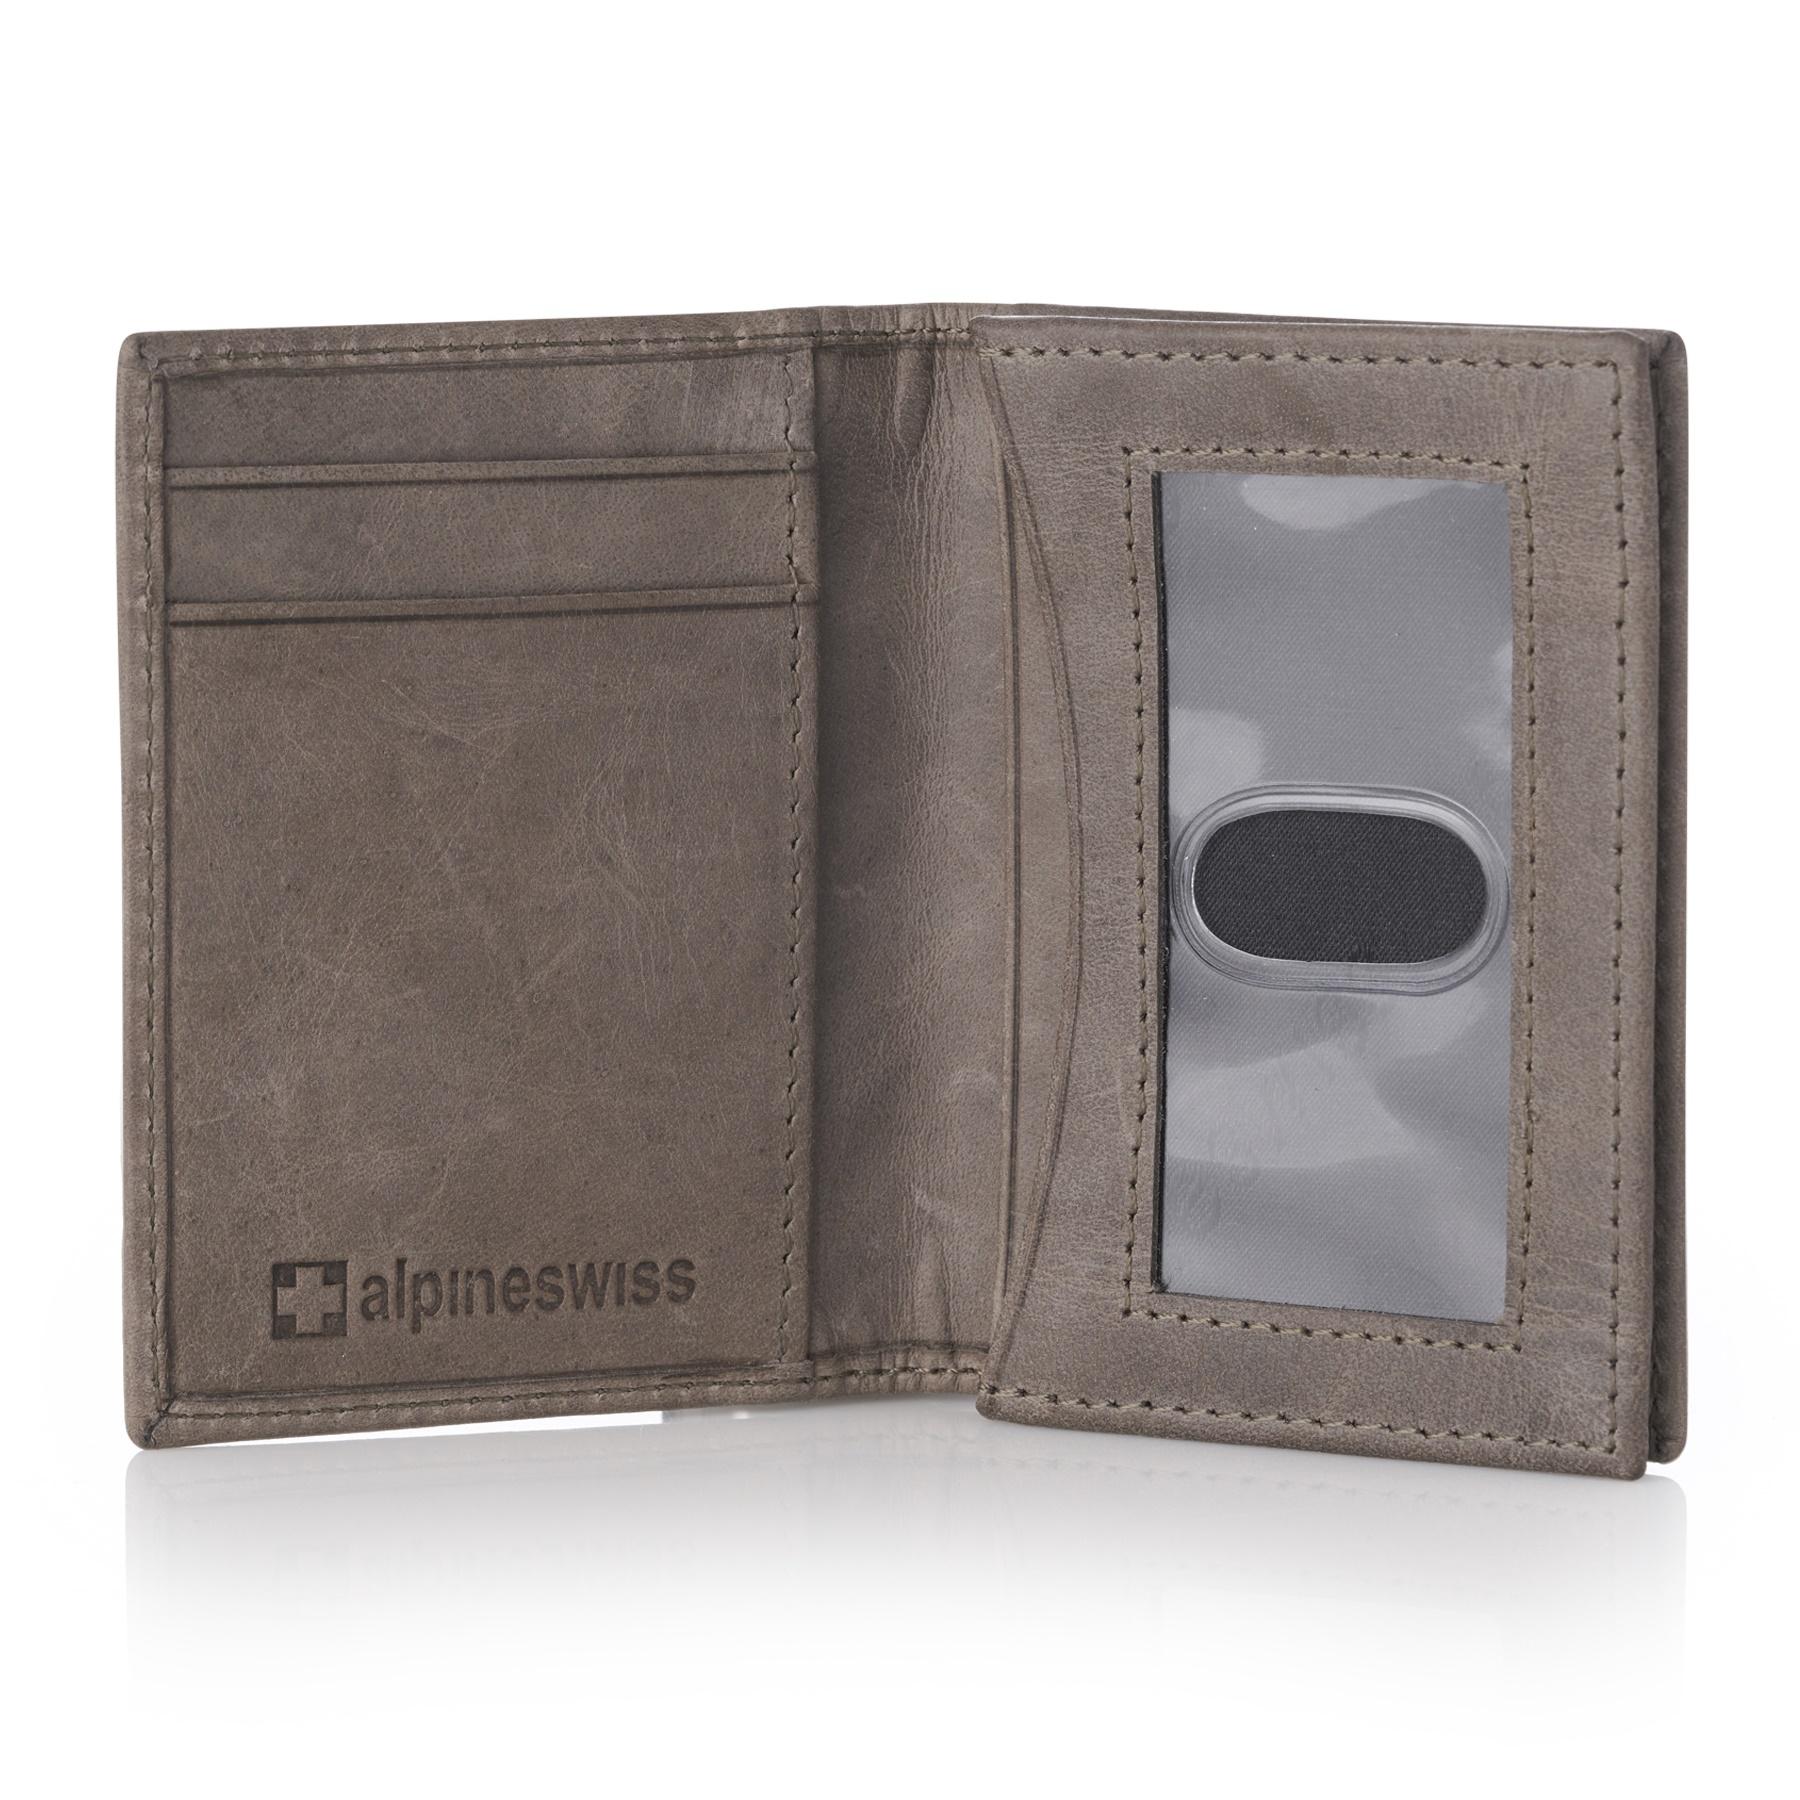 Alpine-Swiss-RFID-Leather-Business-Card-Wallet-Minimalist-ID-Window-Card-Holder thumbnail 45